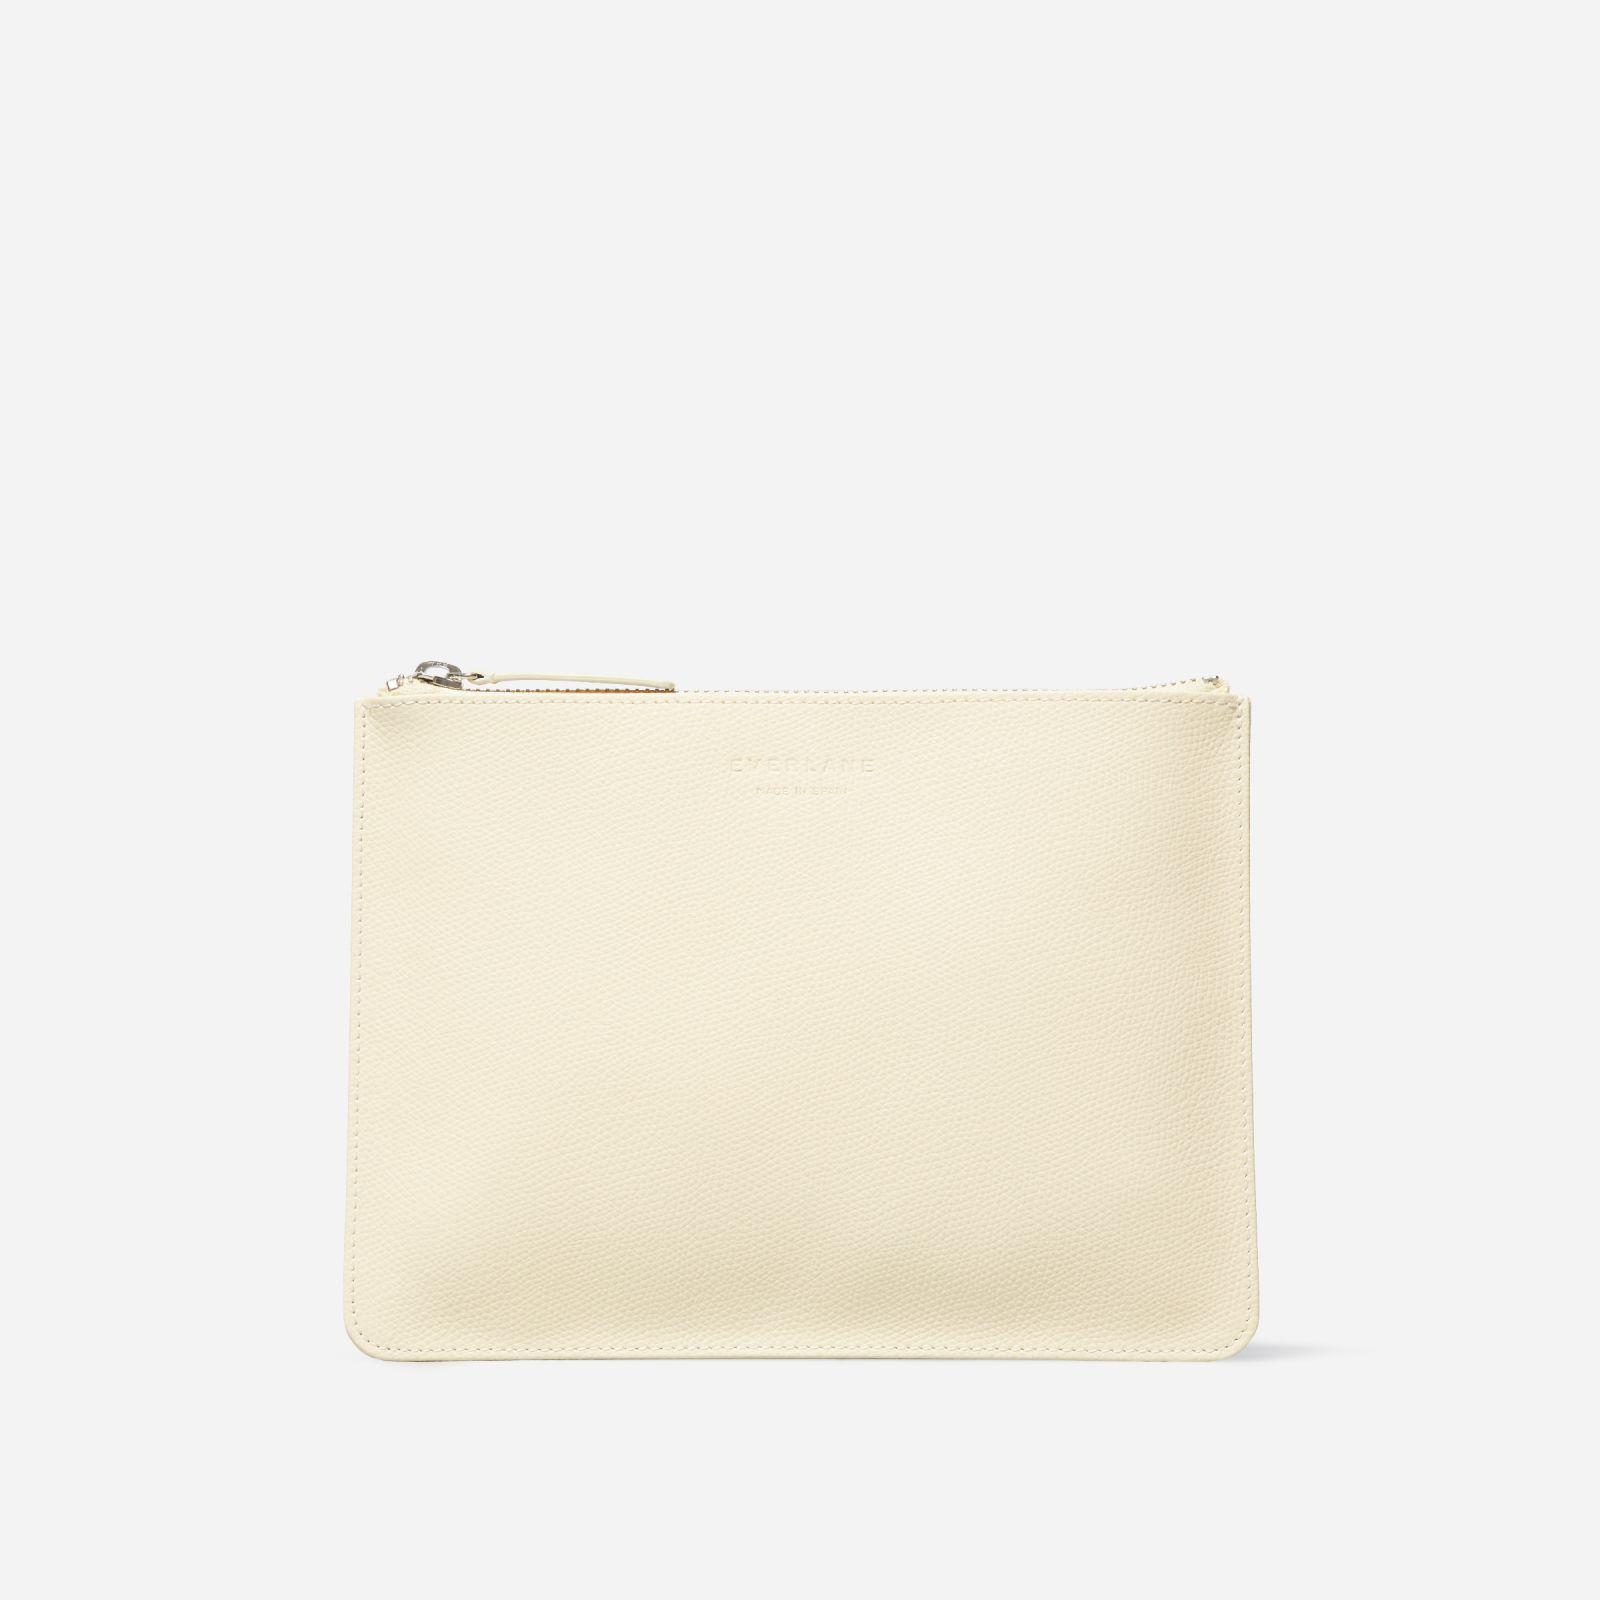 women's leather zip pouch by everlane in bone